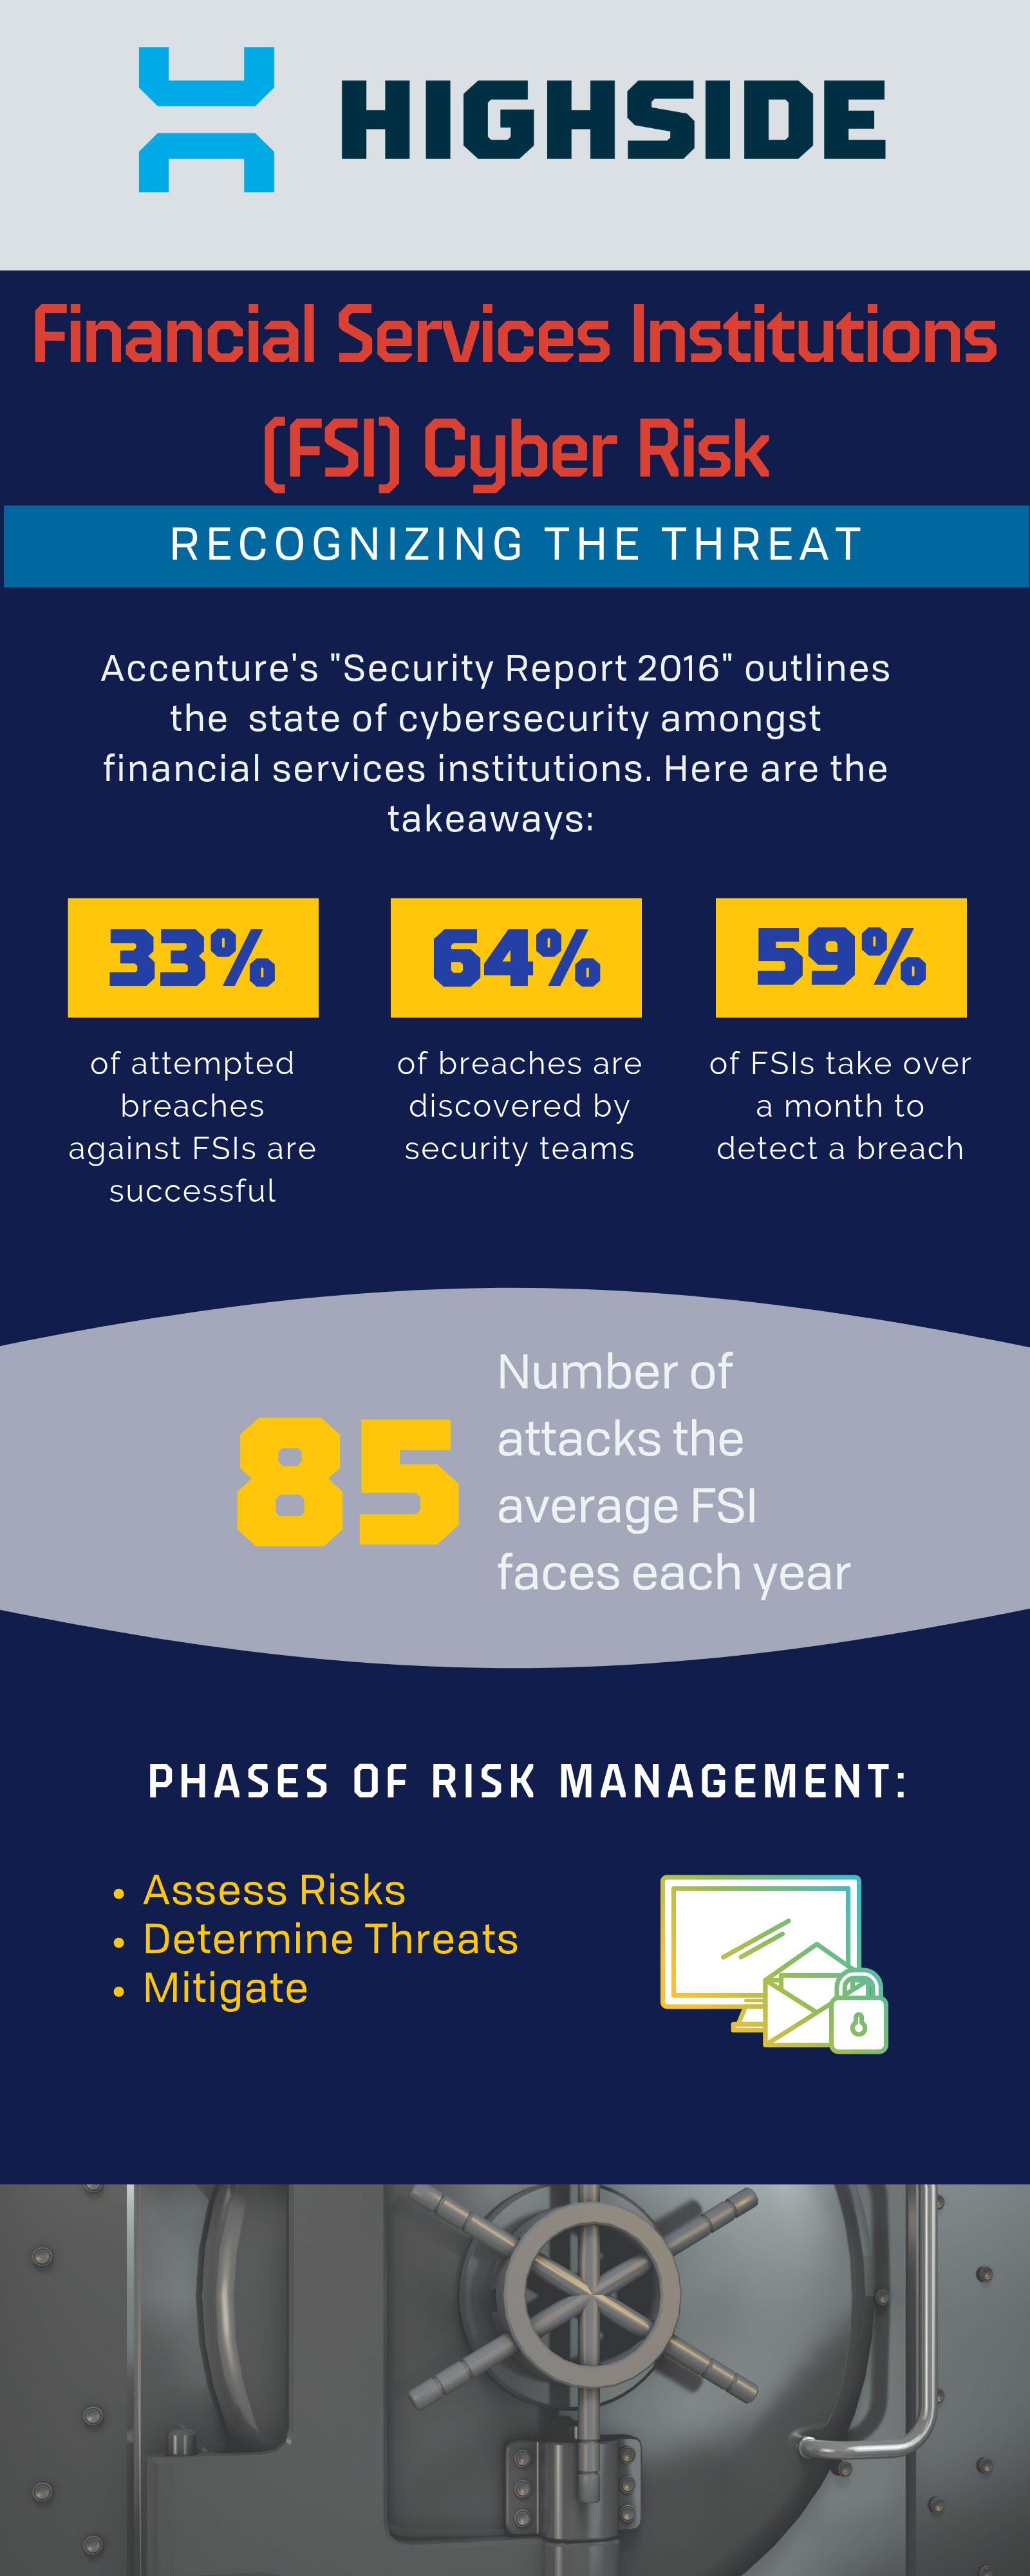 highside-financial-services-cyber-risk (1).jpg